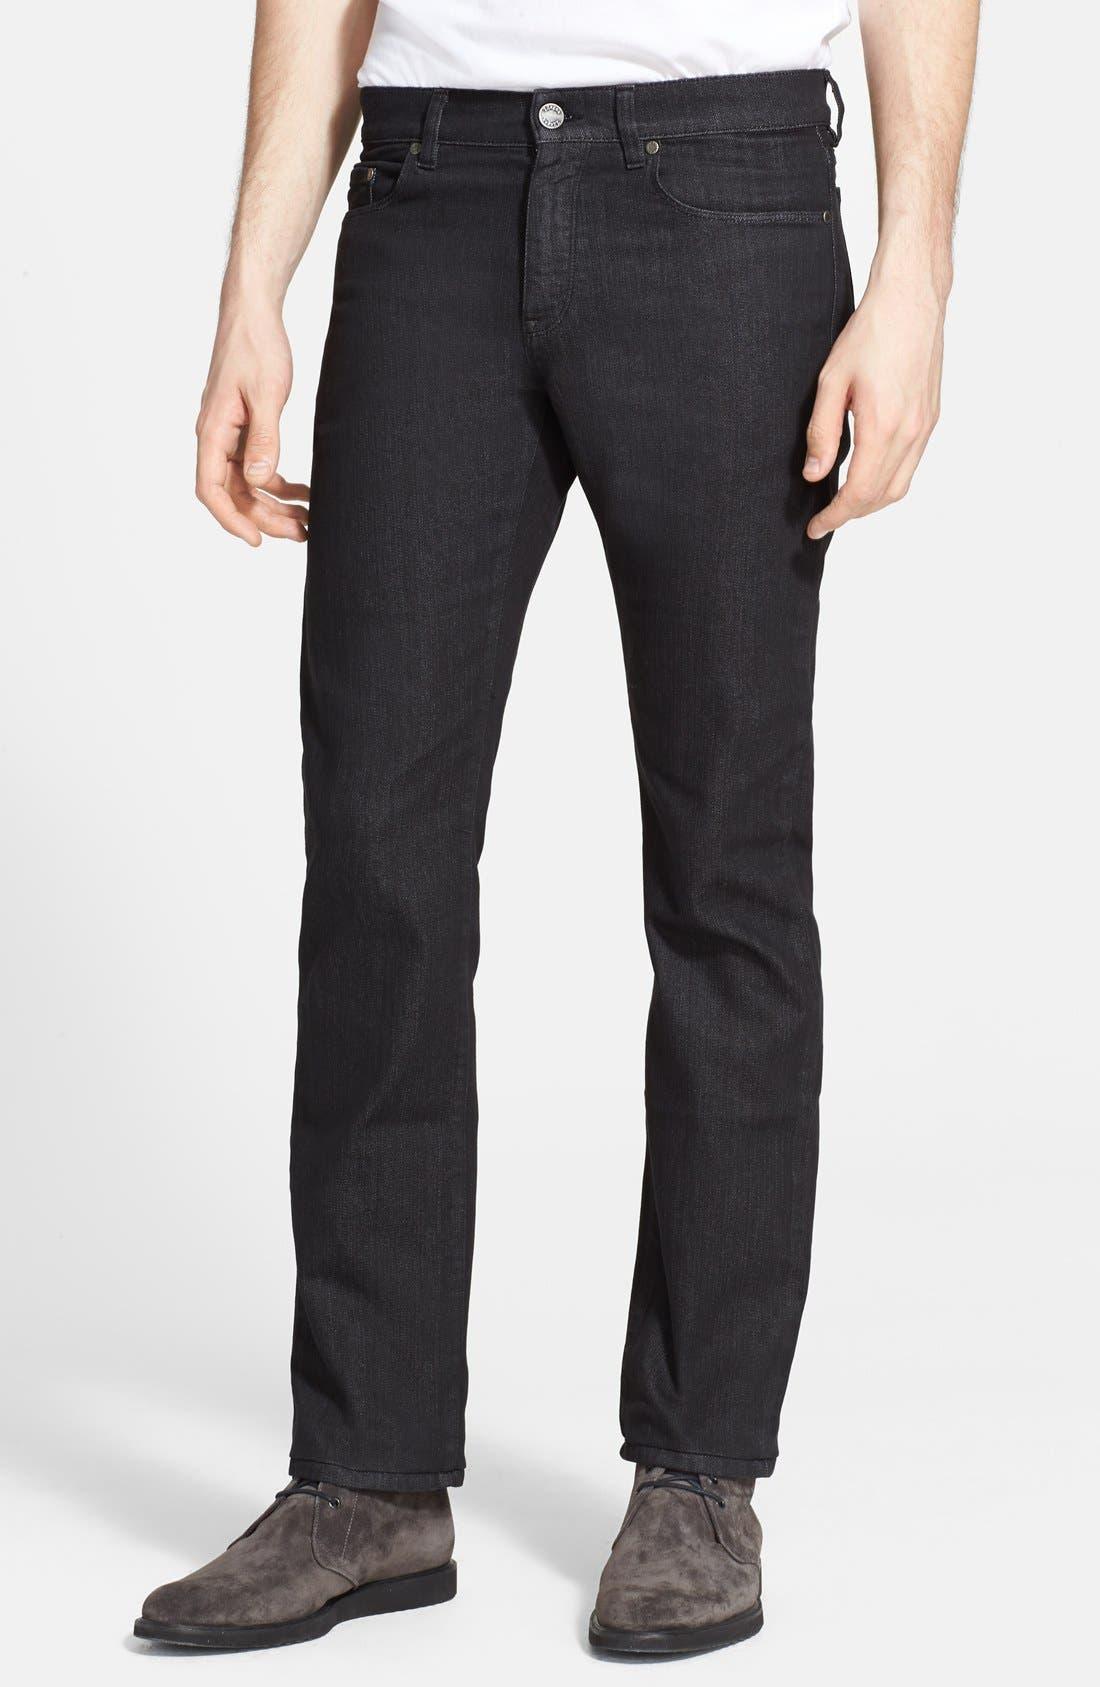 Alternate Image 1 Selected - Z Zegna Slim Straight Leg Jeans (Black Solid)